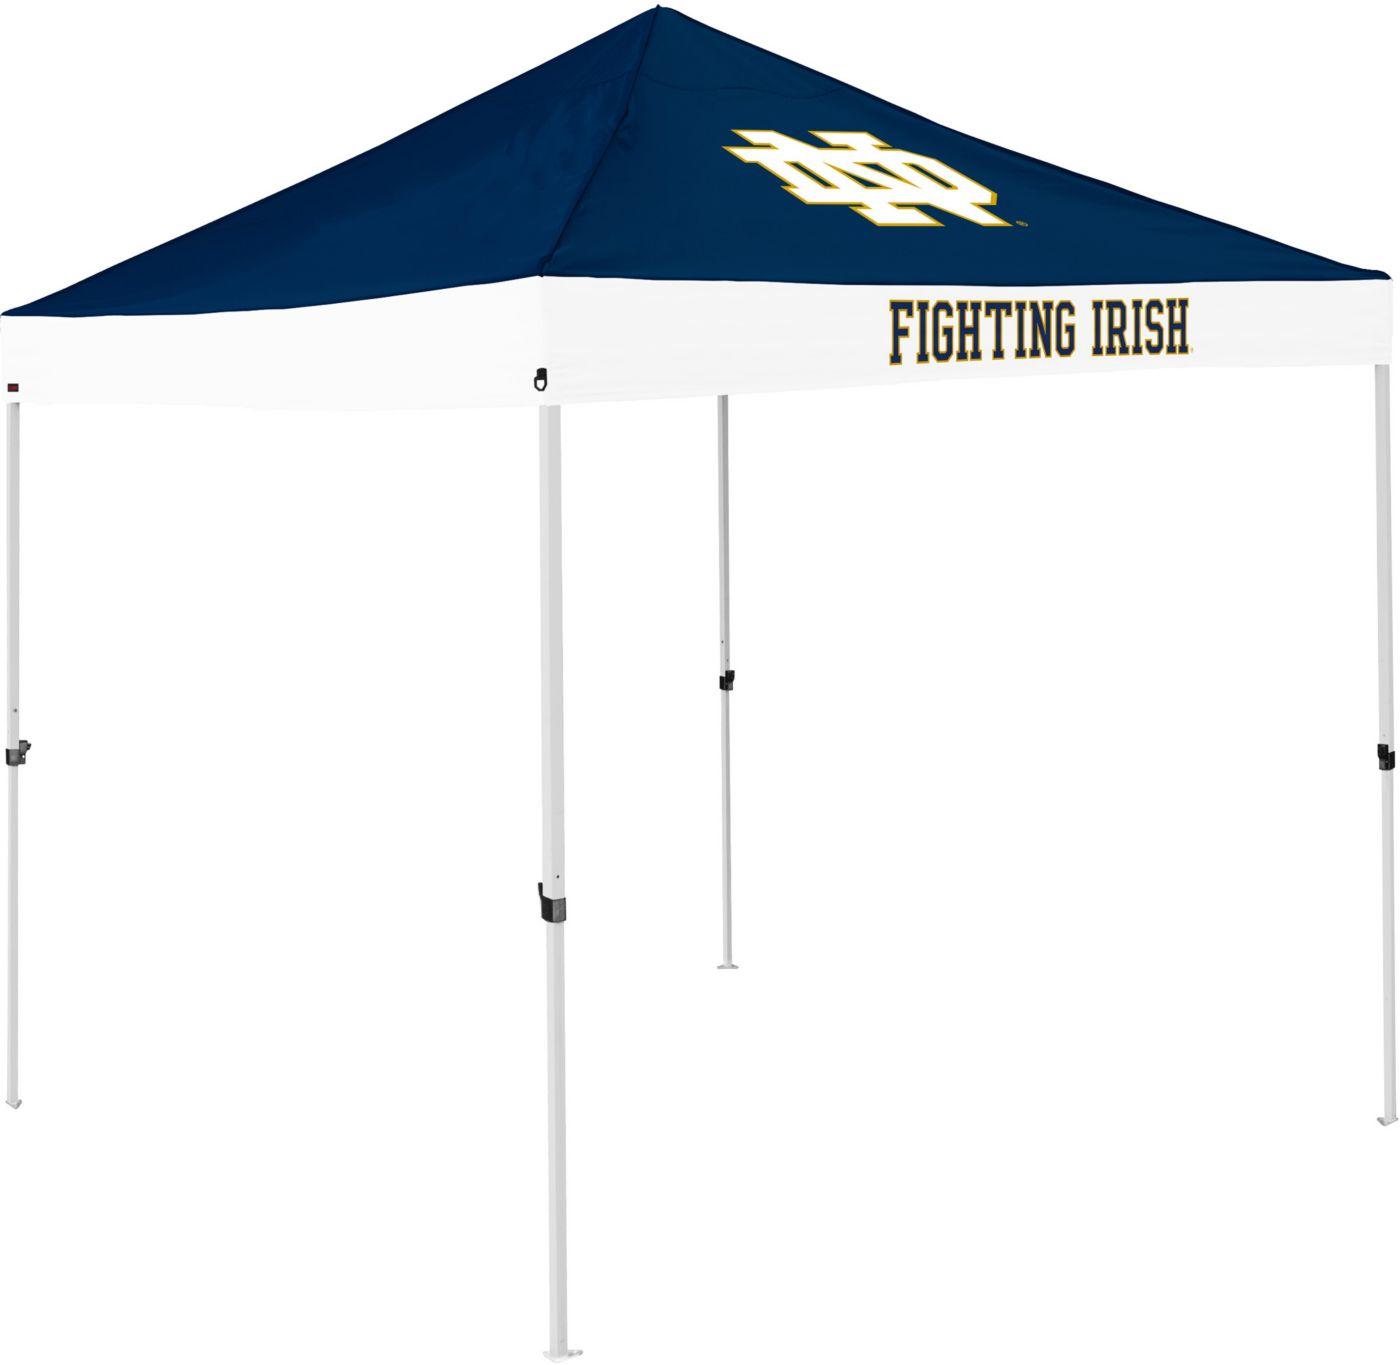 Notre Dame Fighting Irish 9'x9' Canopy Tent